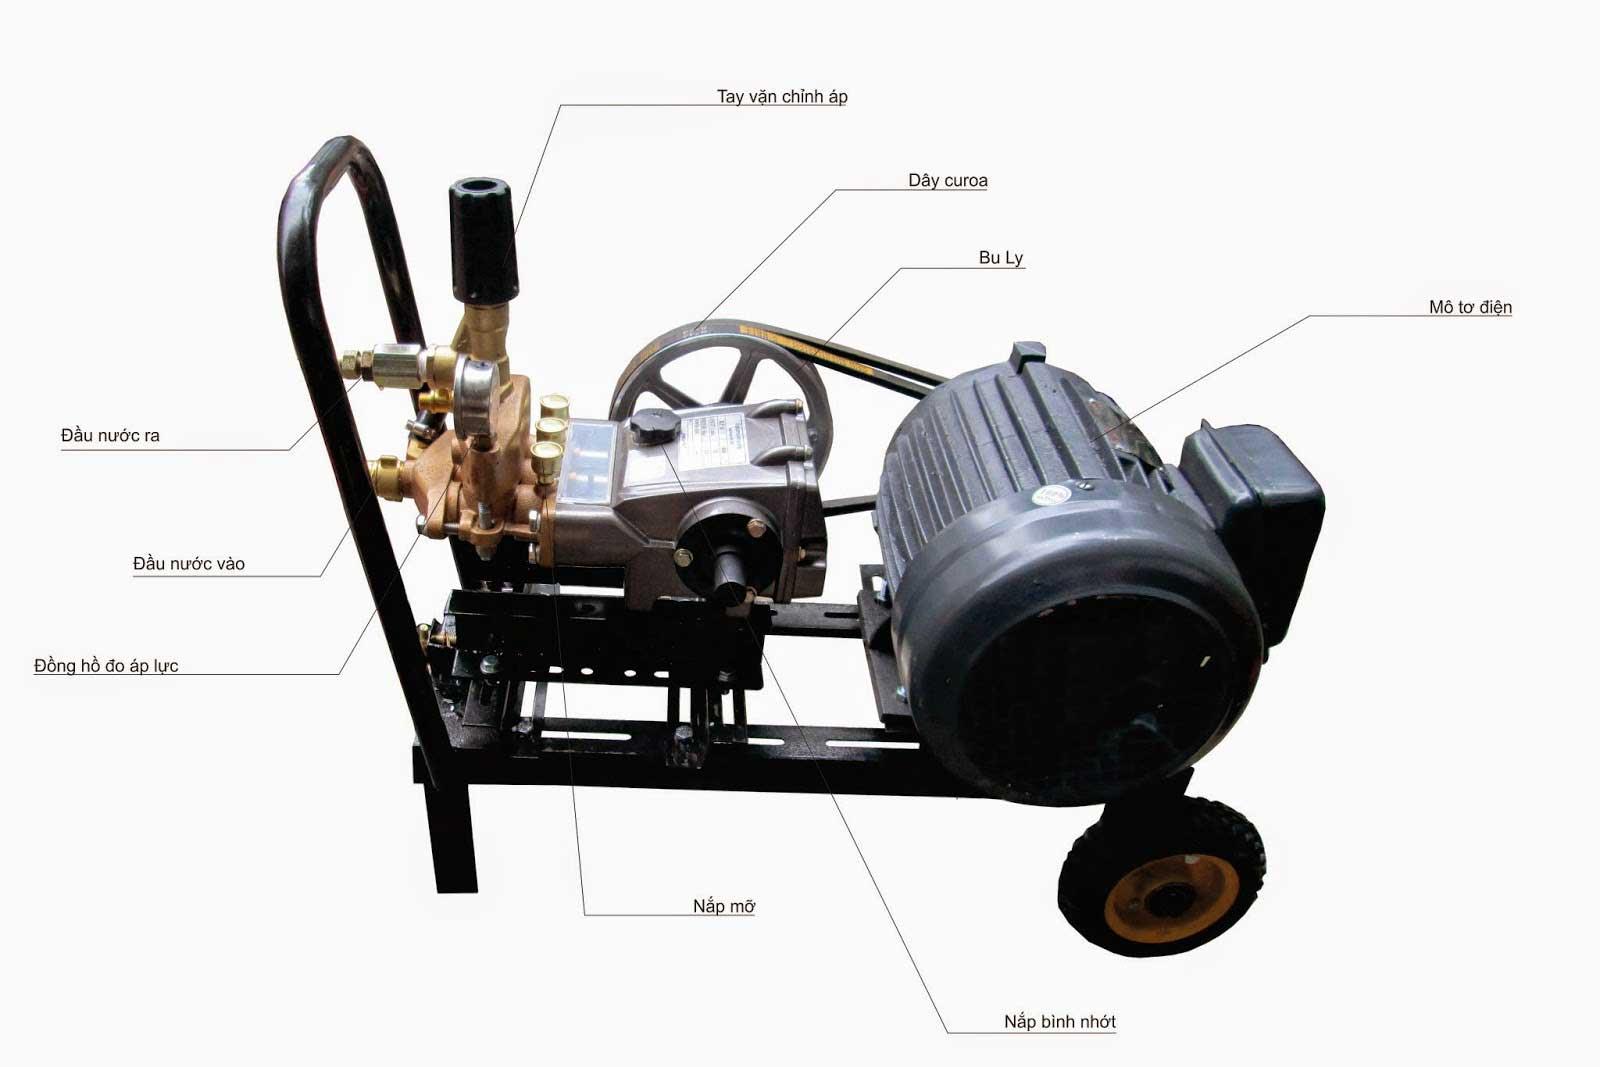 máy rửa xe cao áp đầu bơm piston